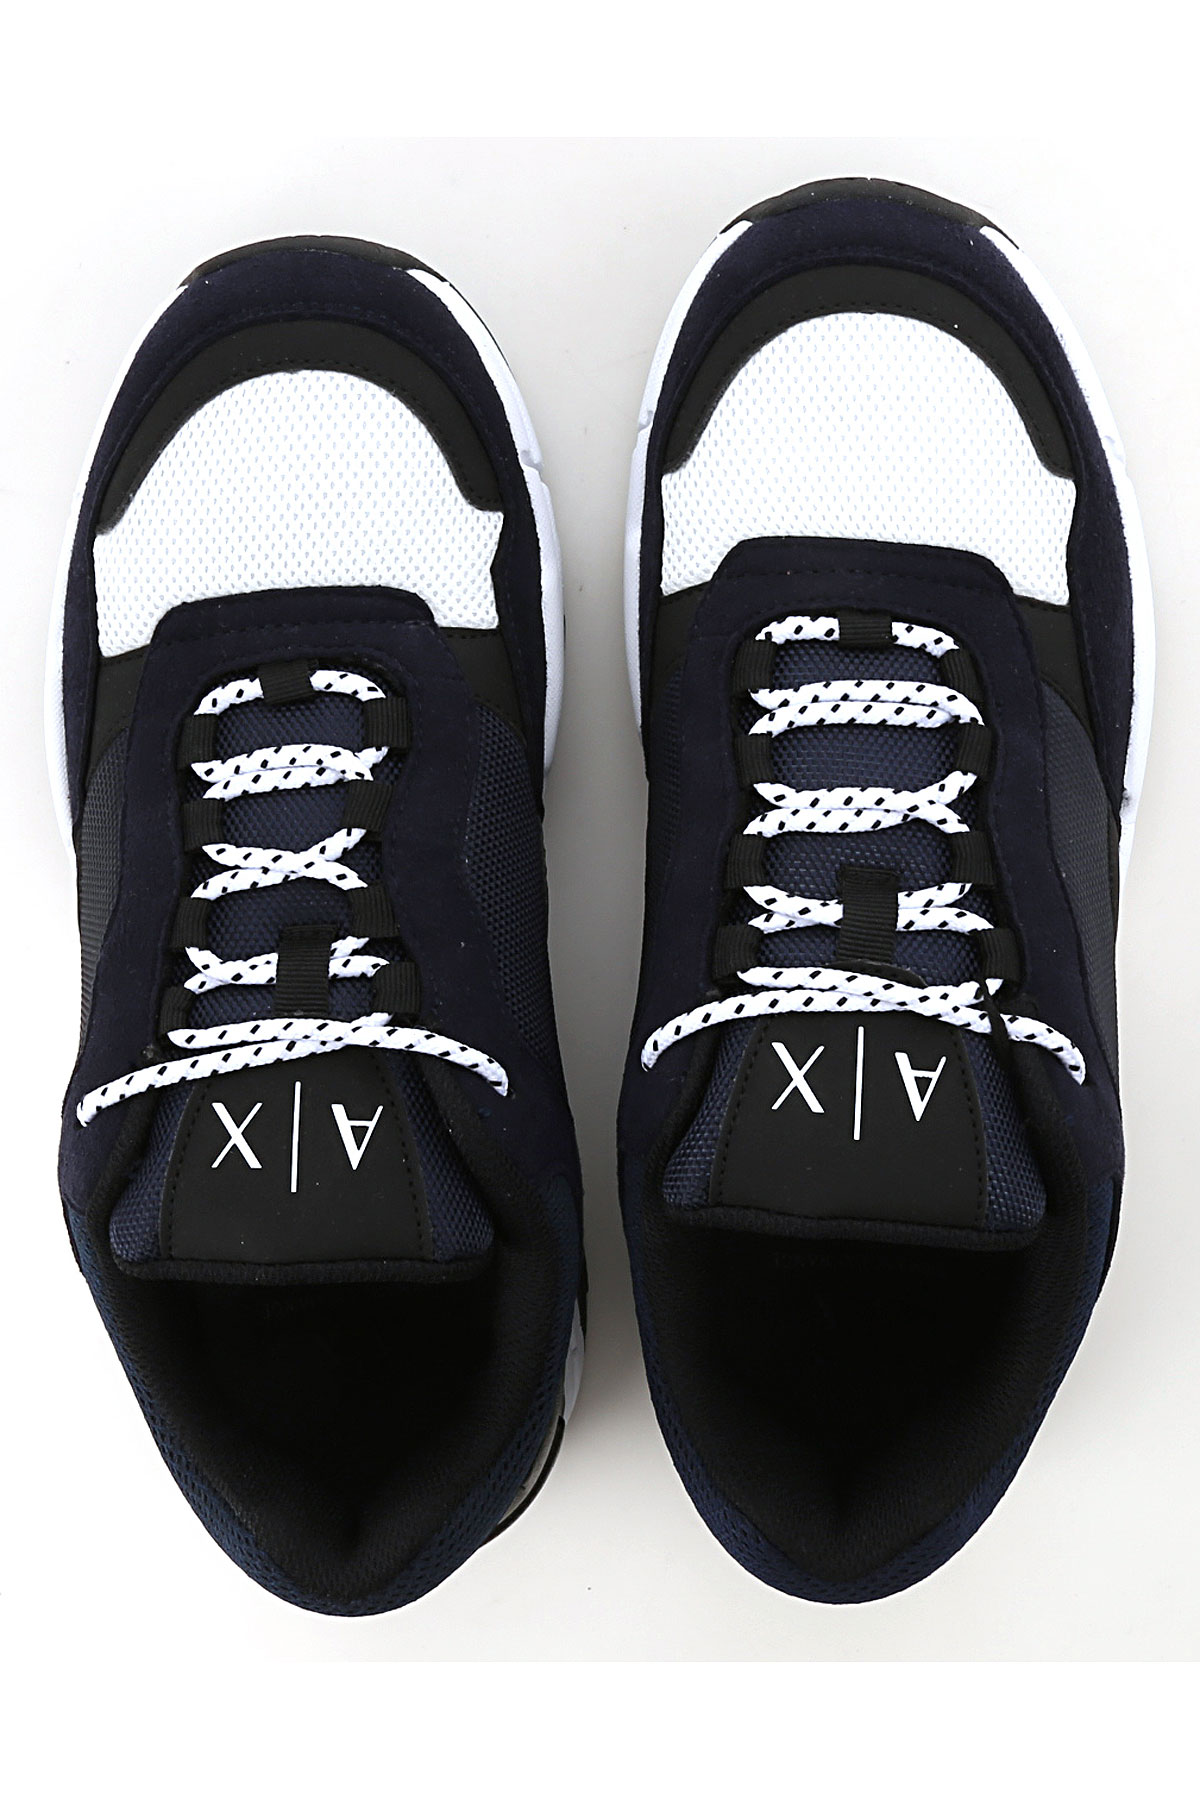 Marino Emporio Para Hombres verano Negro nbsp;blanco 2019 Azul Zapatos Armani Primavera rr8qwx17Z